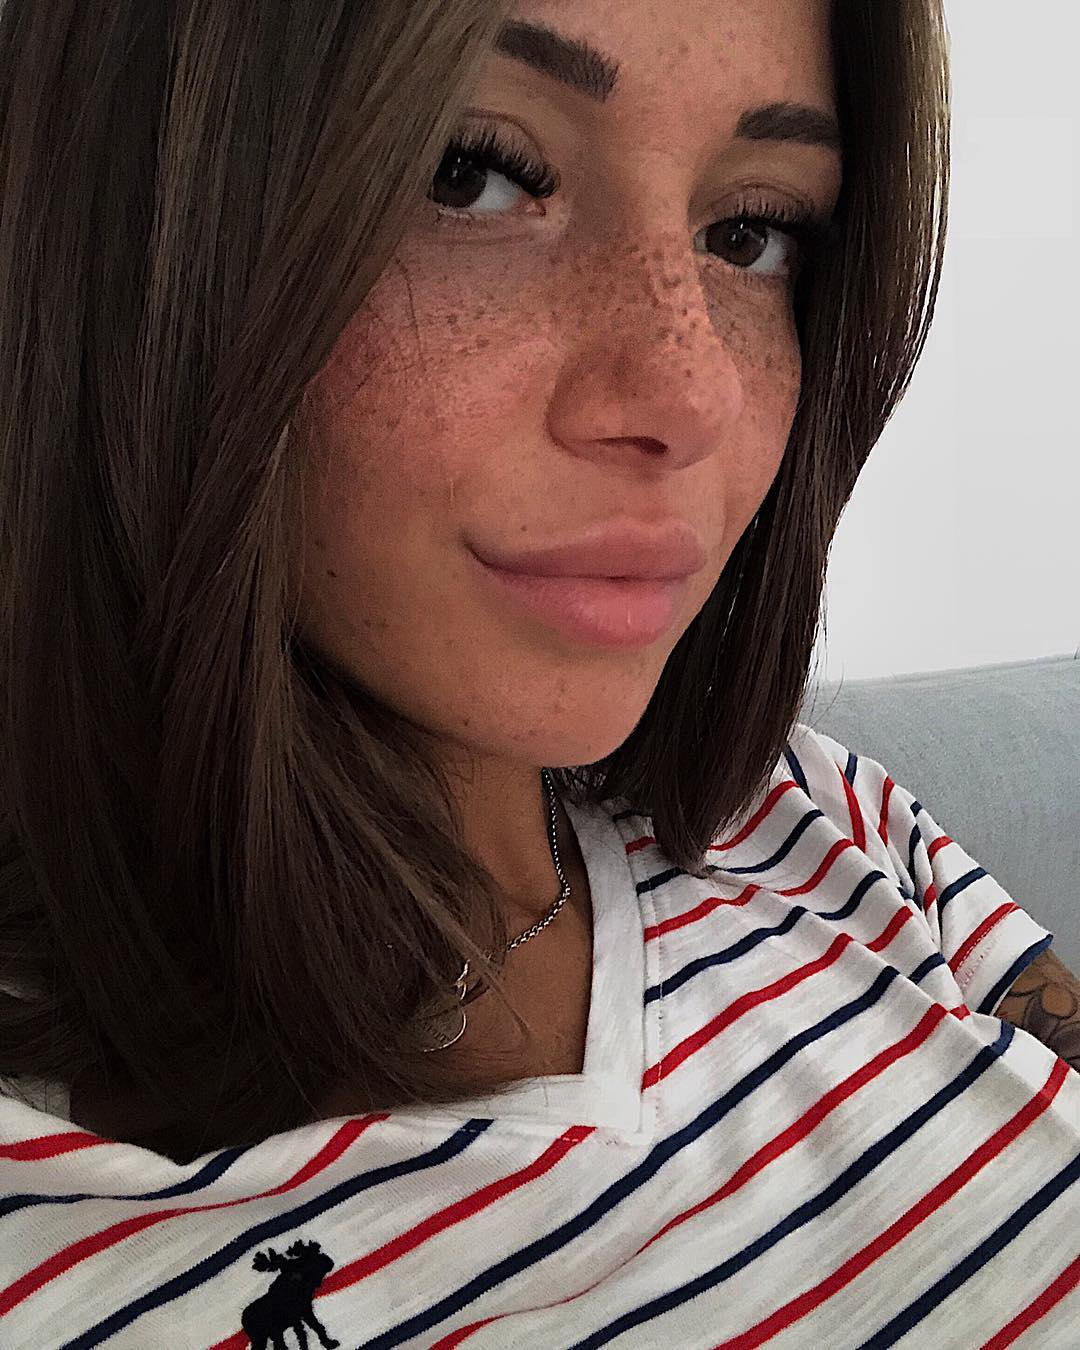 Francesca-Lannuario-Melillo-Wallpapers-Insta-Fit-Bio-4